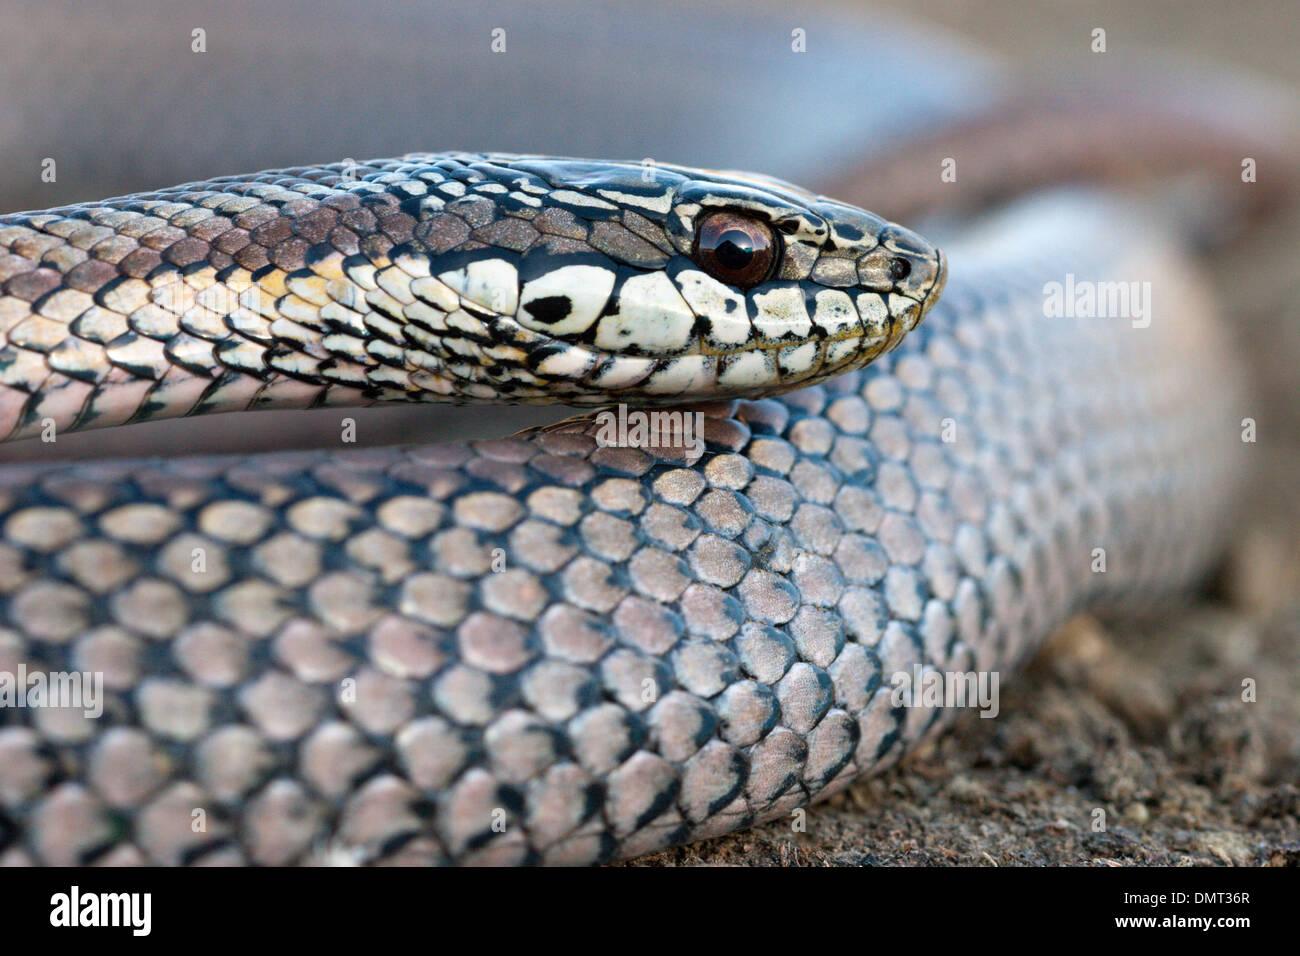 snake poisonous venomous culebra con cola larga Chile Stock Photo